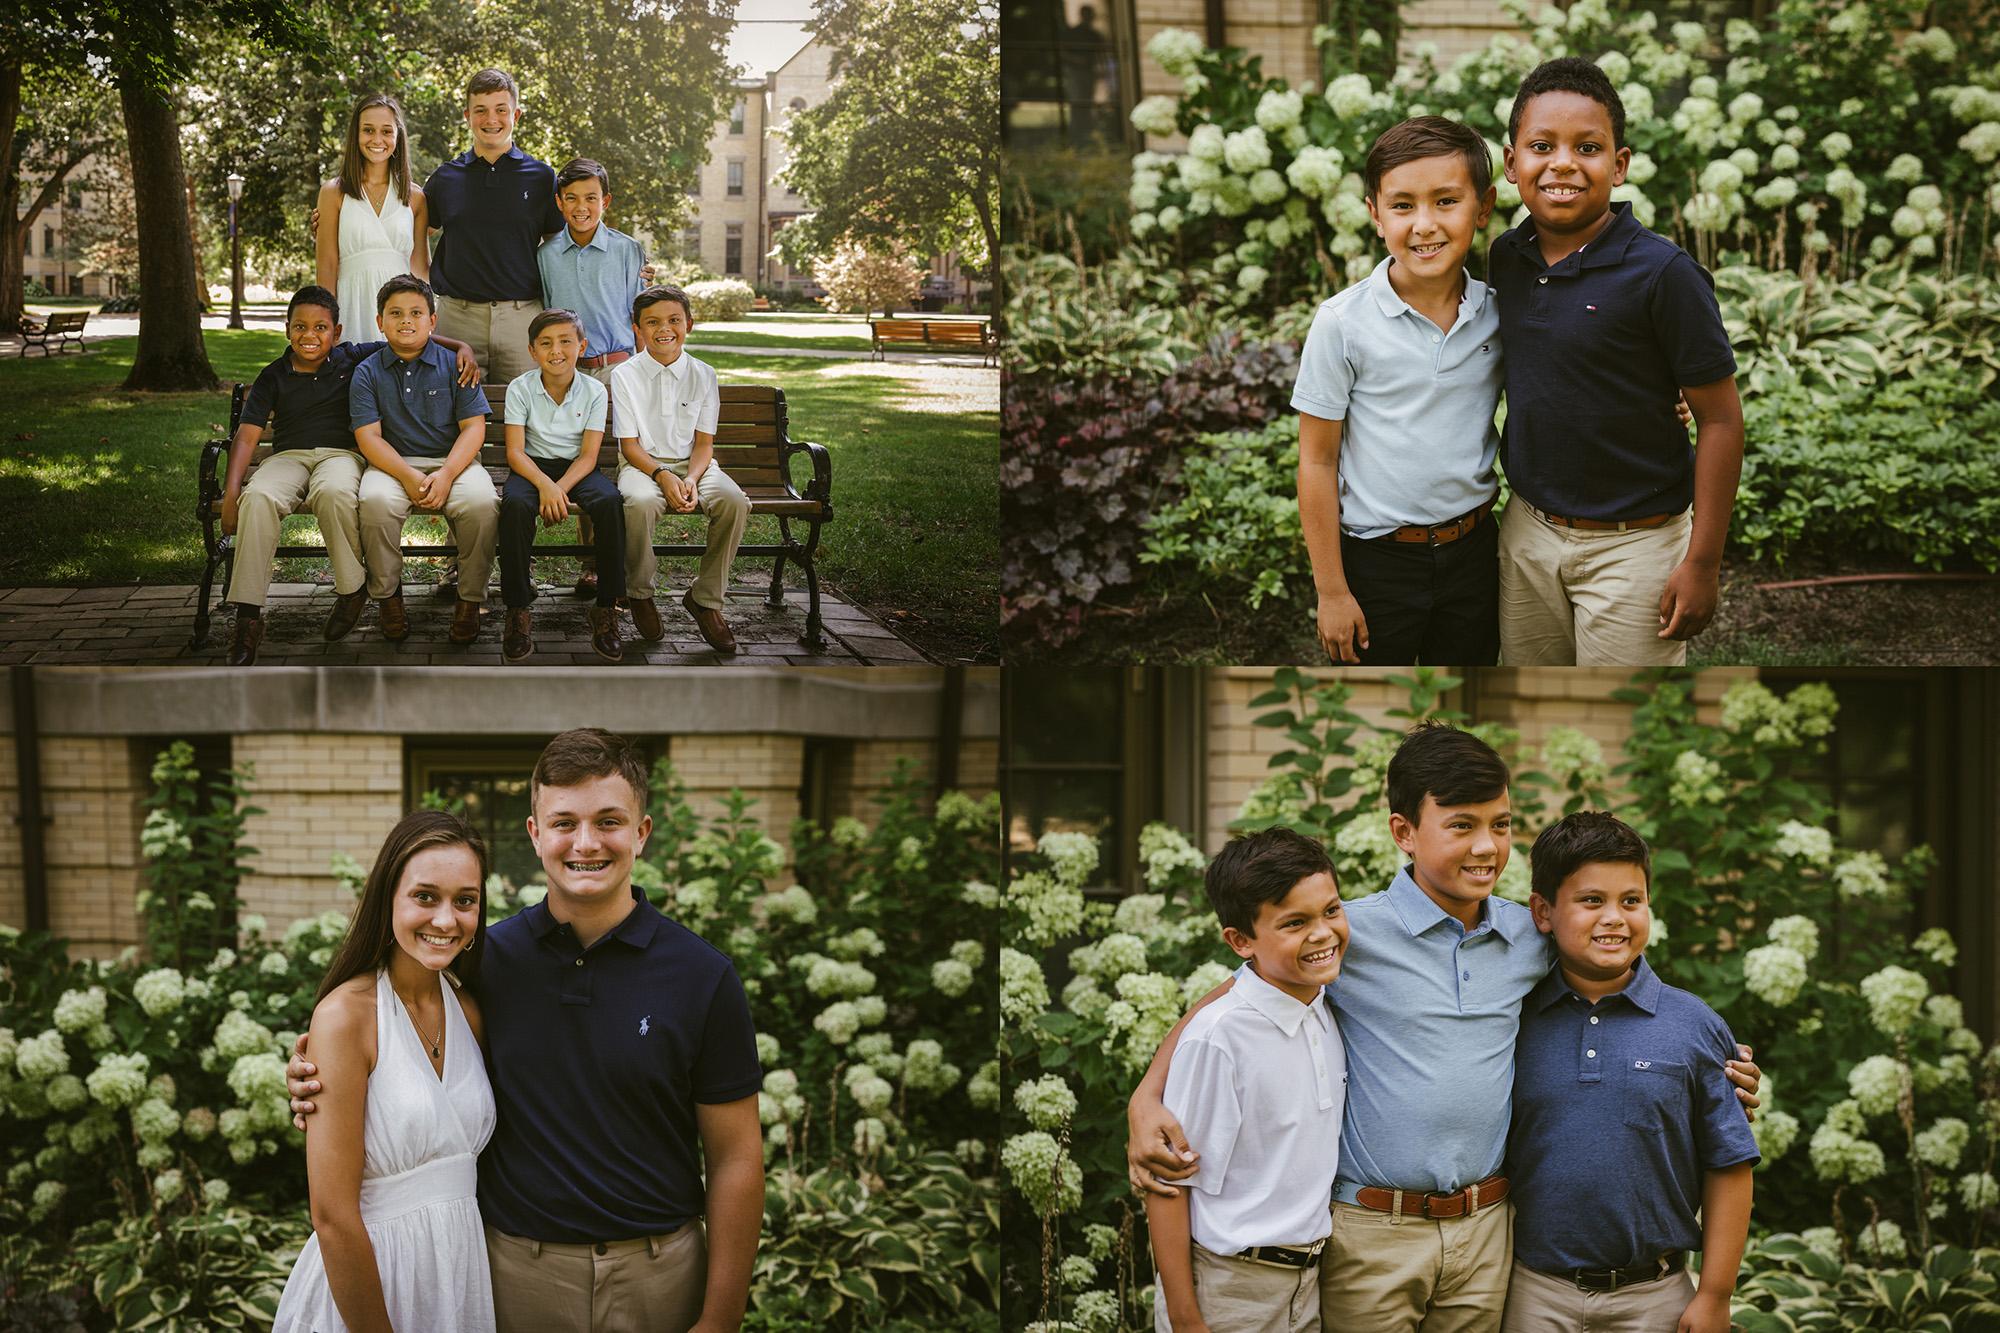 005 haggard family photos web.jpg